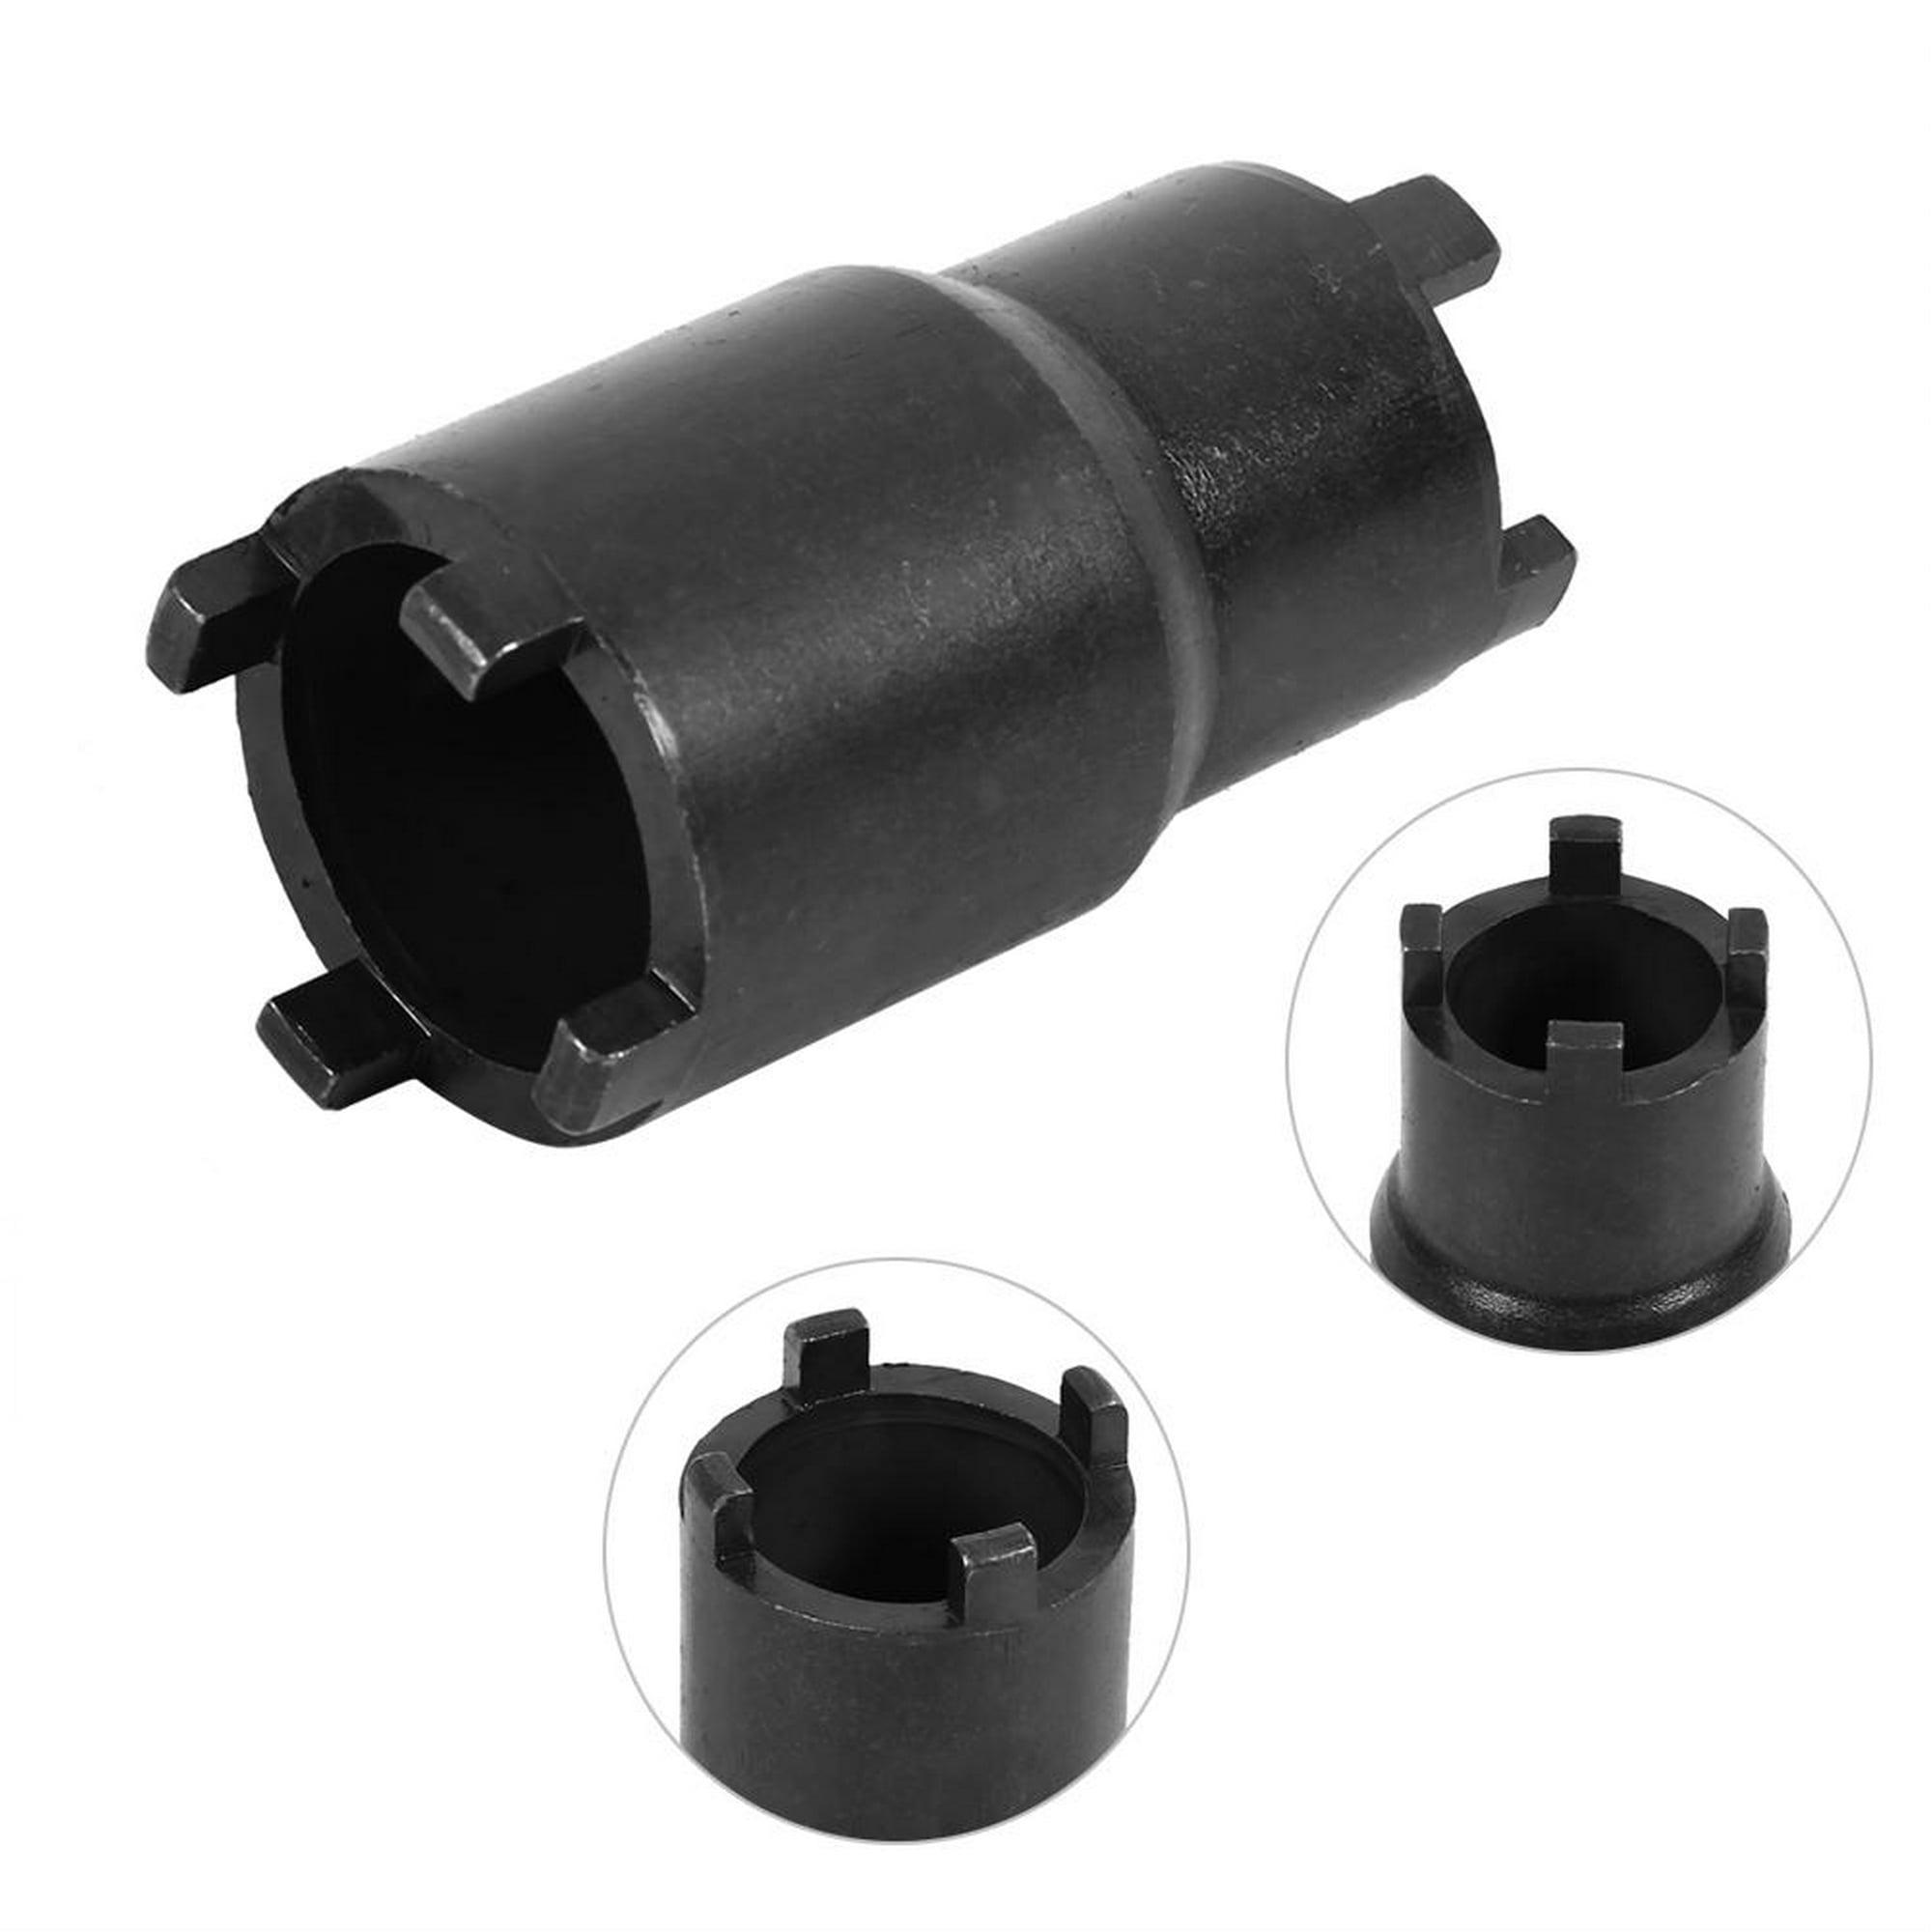 Garosa Lock Nut Wrench,20/24mm Clutch Tool Lock Nut Spanner Wrench For  Honda Crf 600rr 450r 250l,Clutch Lock Nut Spanner